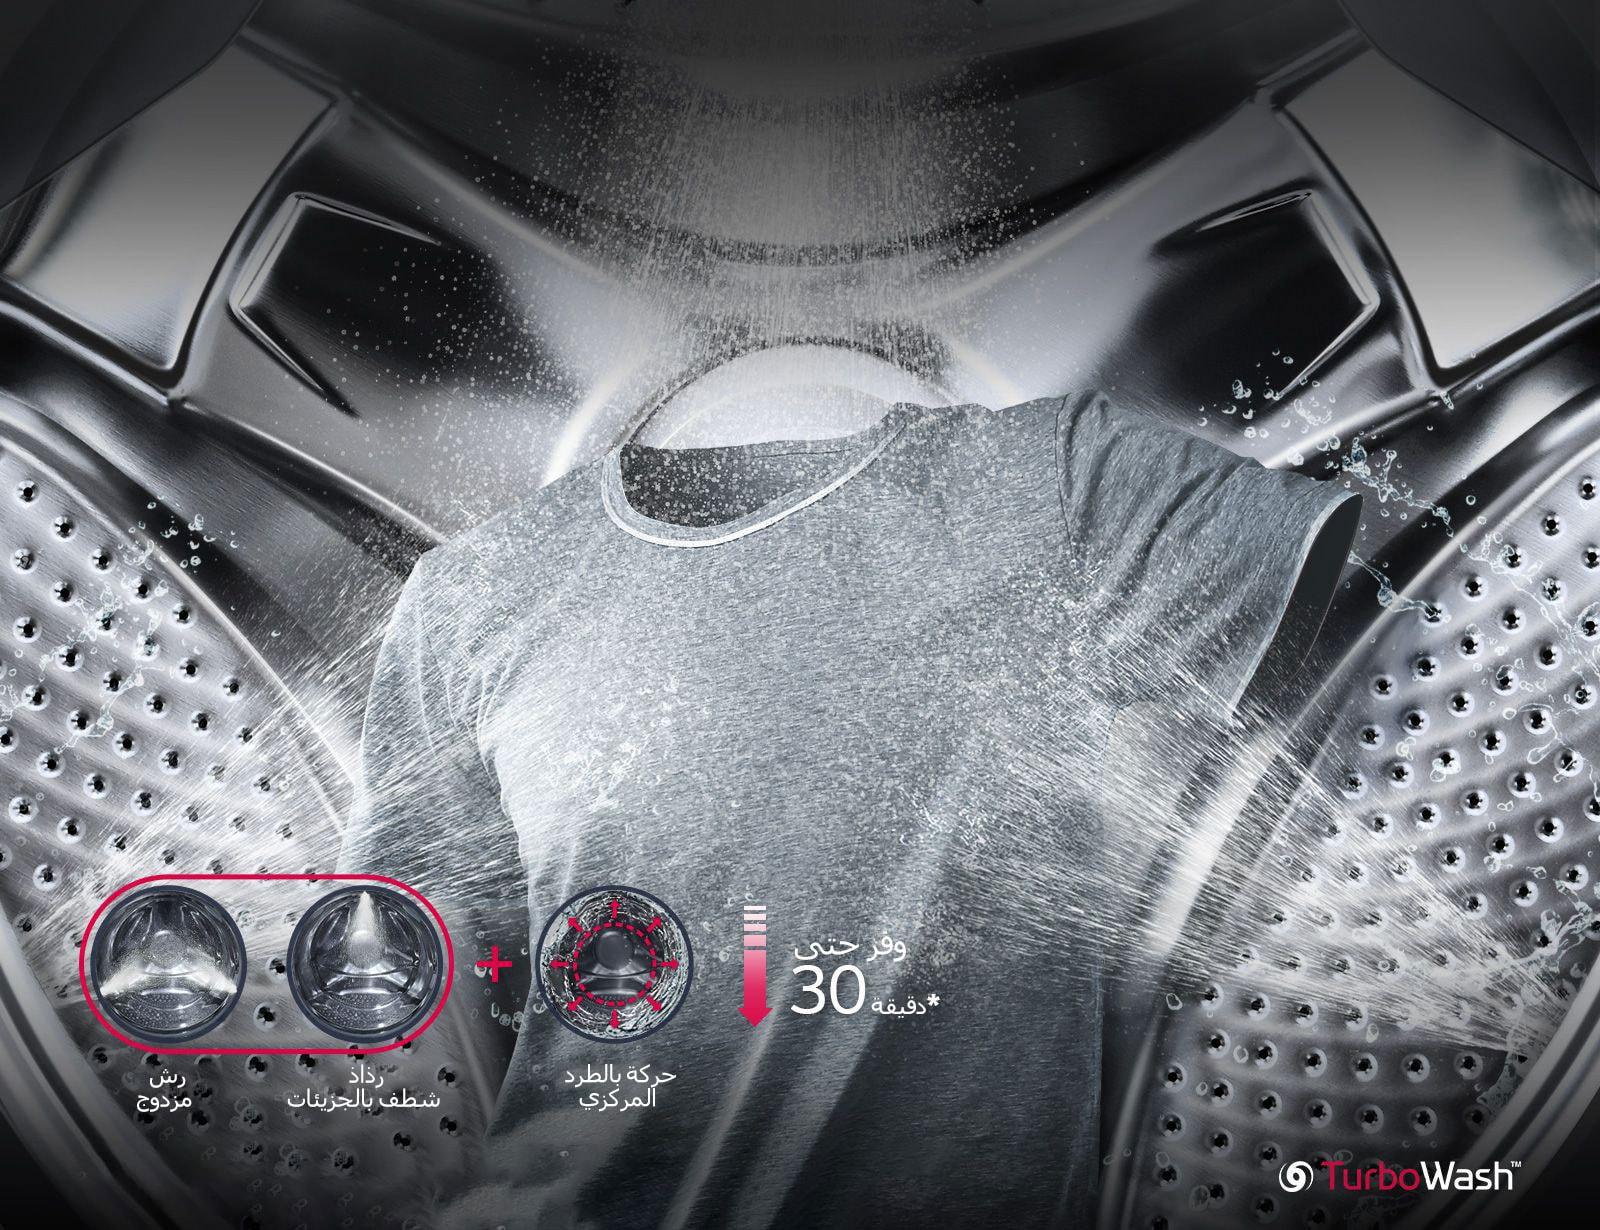 F0K2CHK5T2_03_TurboWash_D_17032019